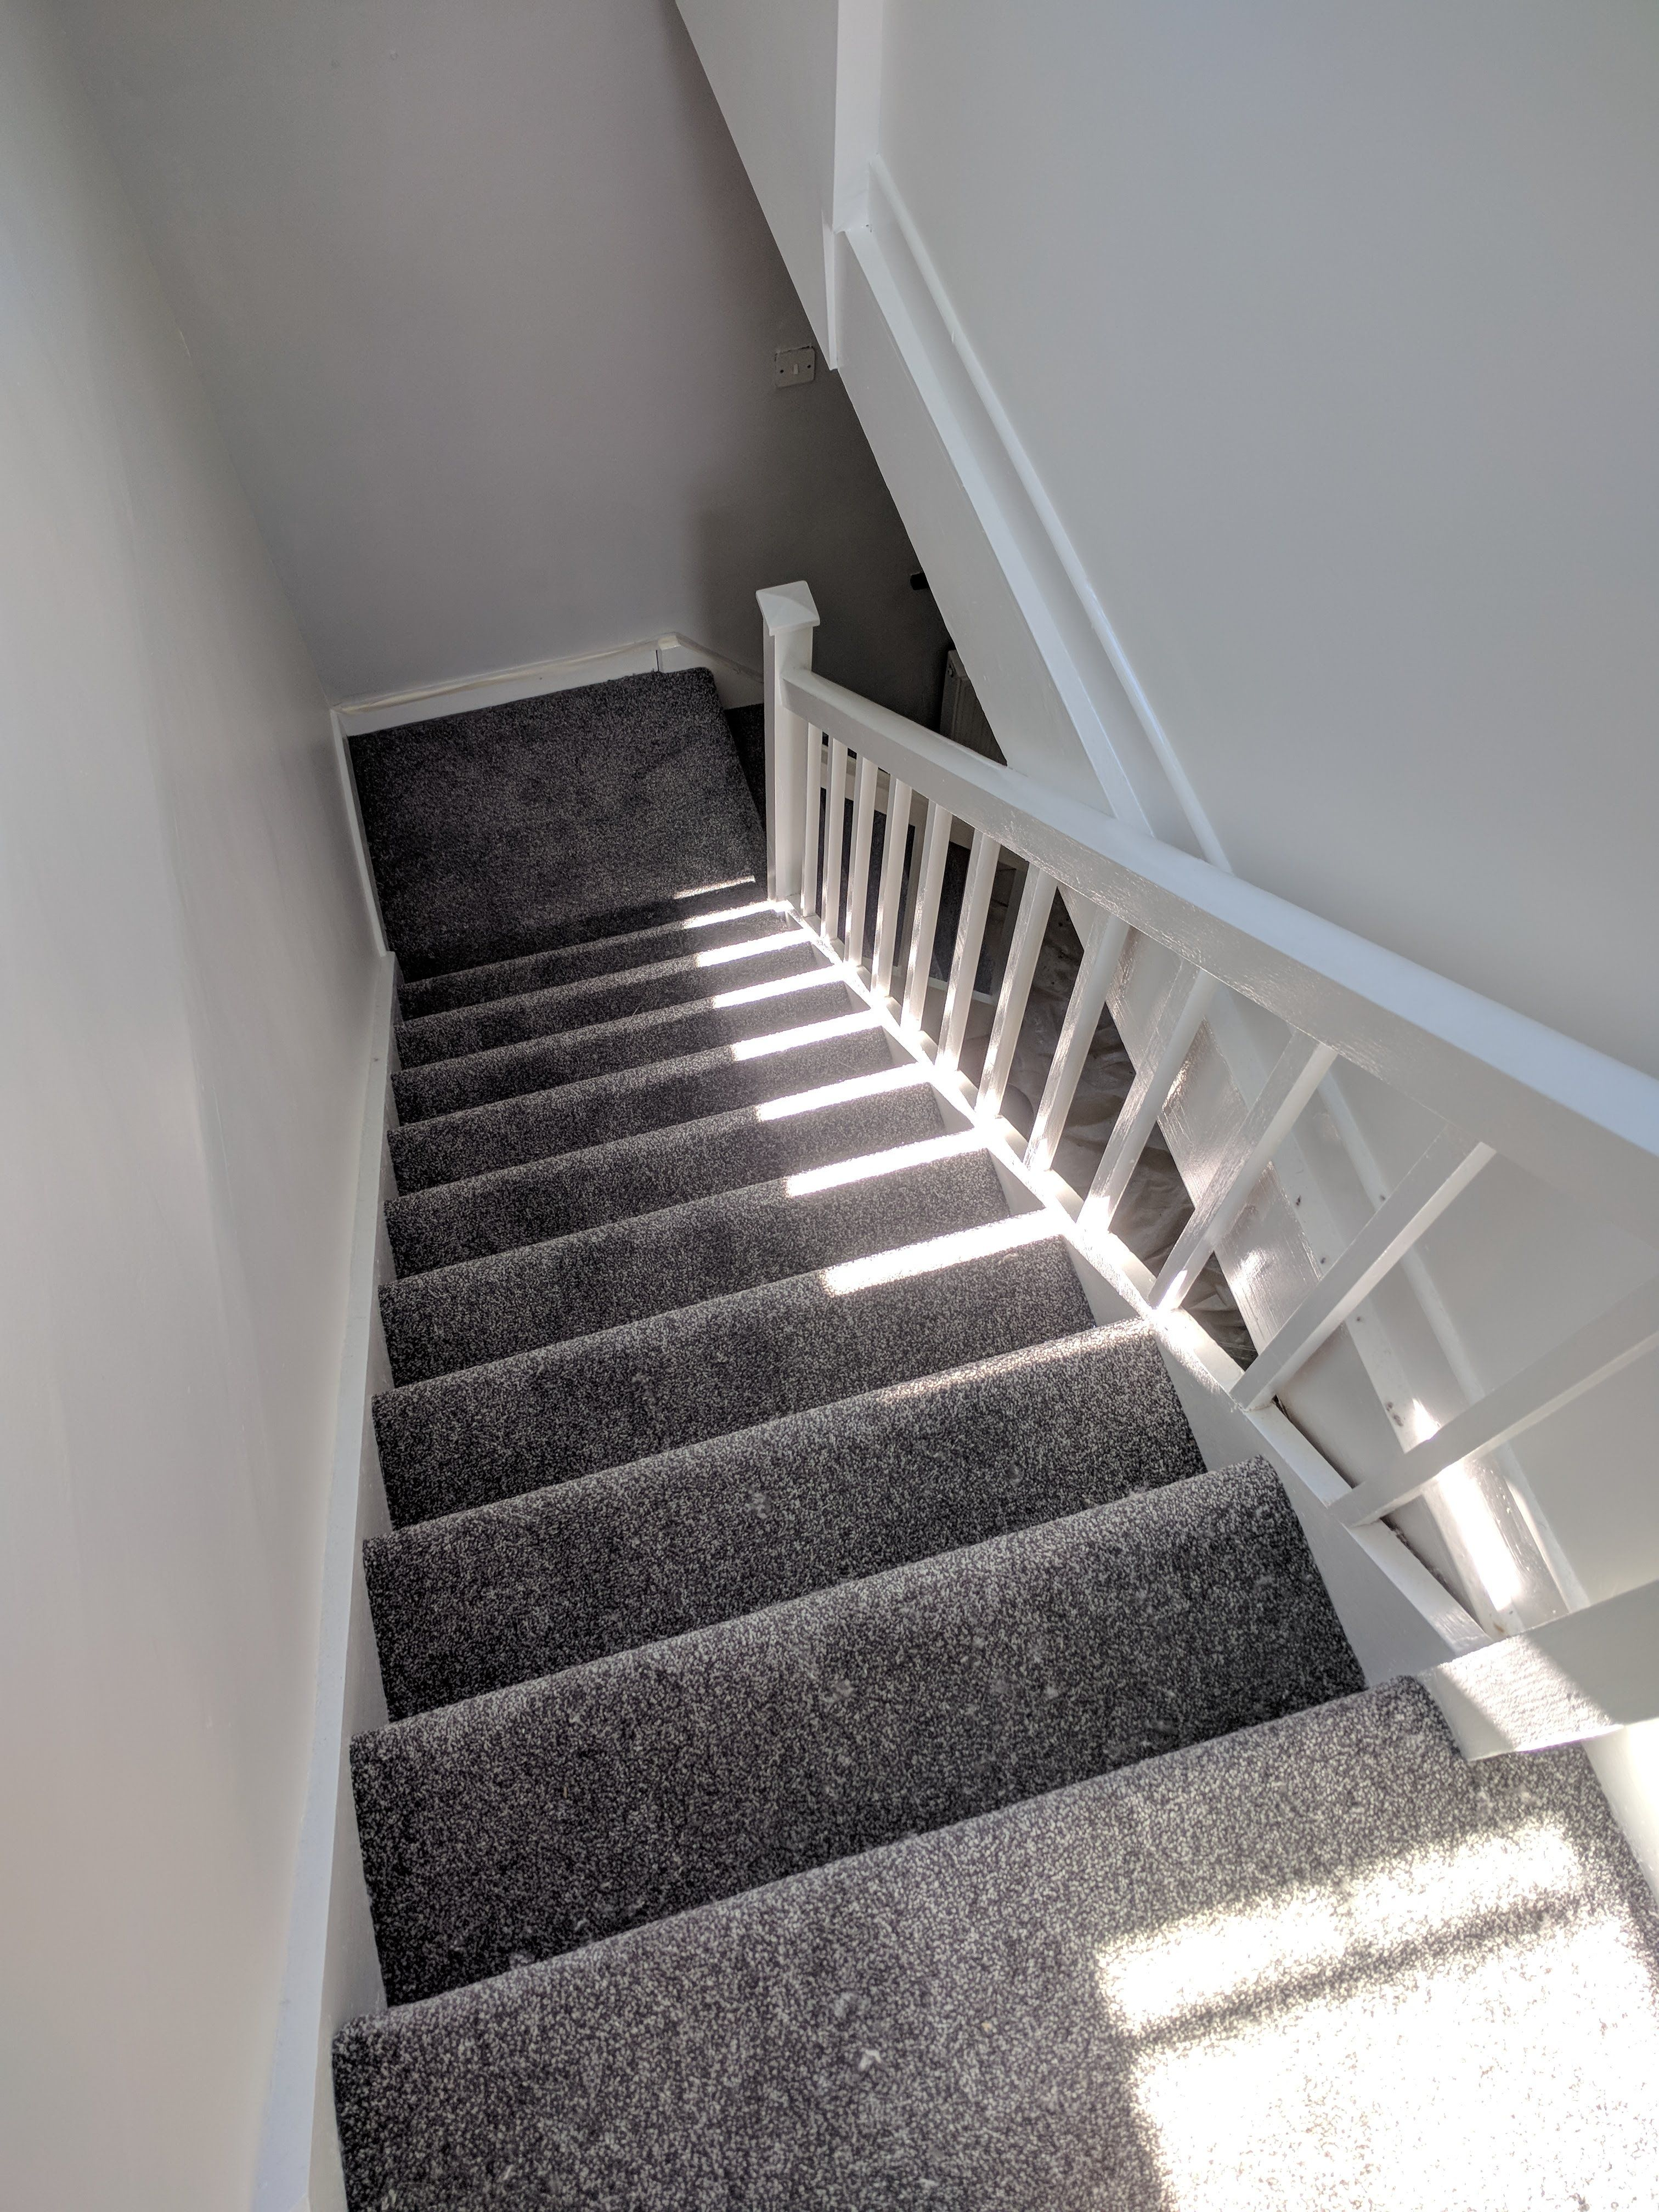 Dark Grey Carpet Install On Stairs And Landing Grey Stair | Dark Carpet On Stairs | Gray | Monochrome | Wall | Modern | Metal Bar On Stair